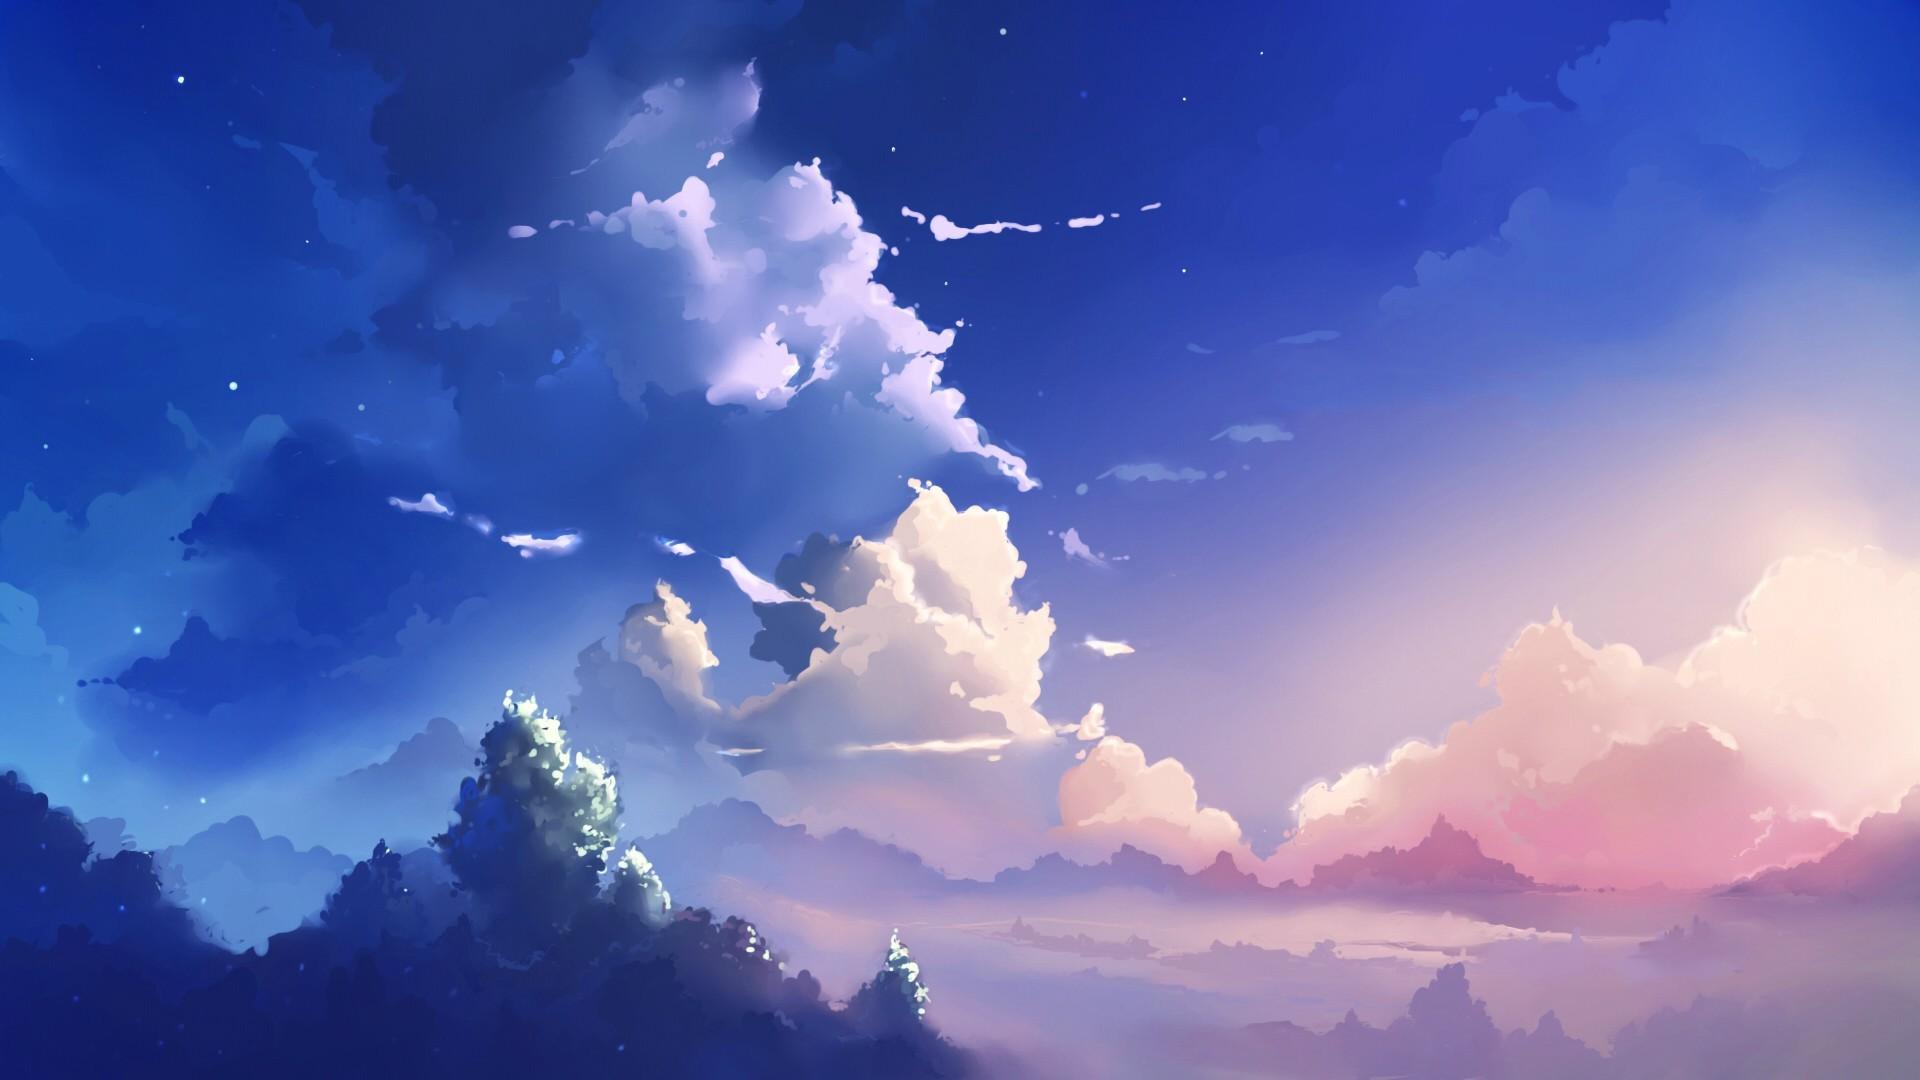 Anime 1920x1080 5 Centimeters Per Second anime Makoto Shinkai  sky clouds pink peaceful artwork nature outdoors